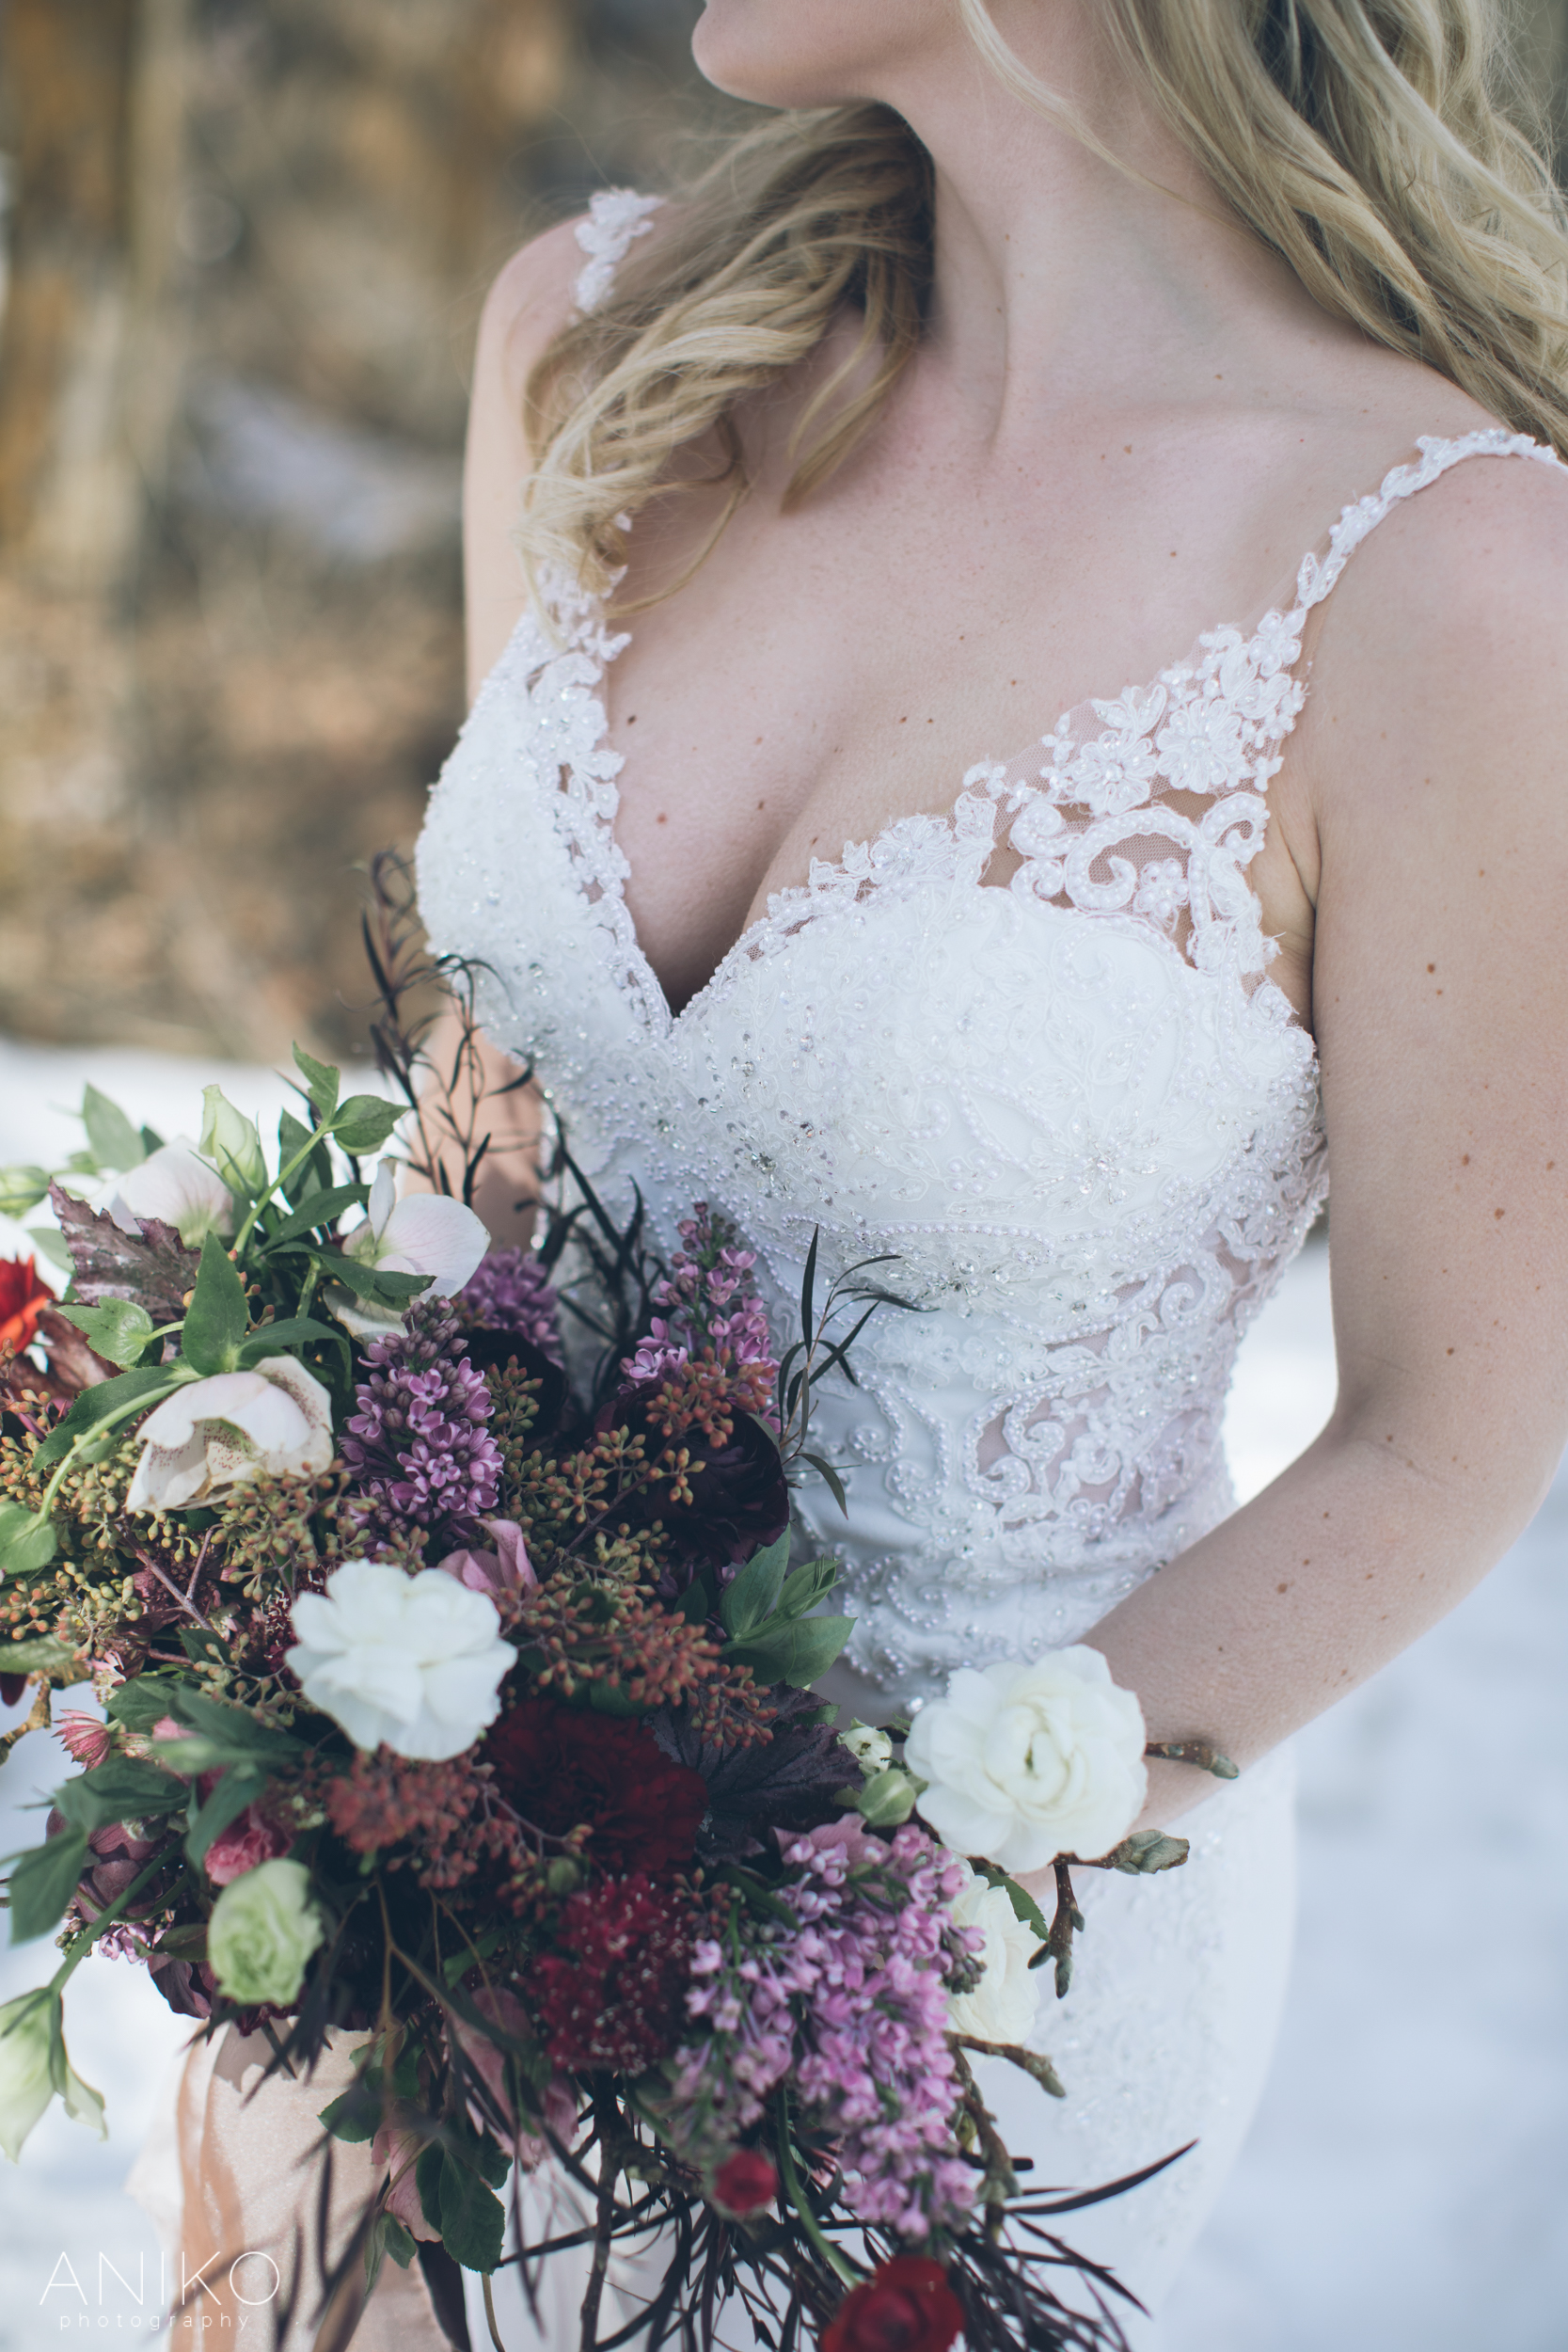 aniko-photography-portland-wedding-photographers-168.jpg